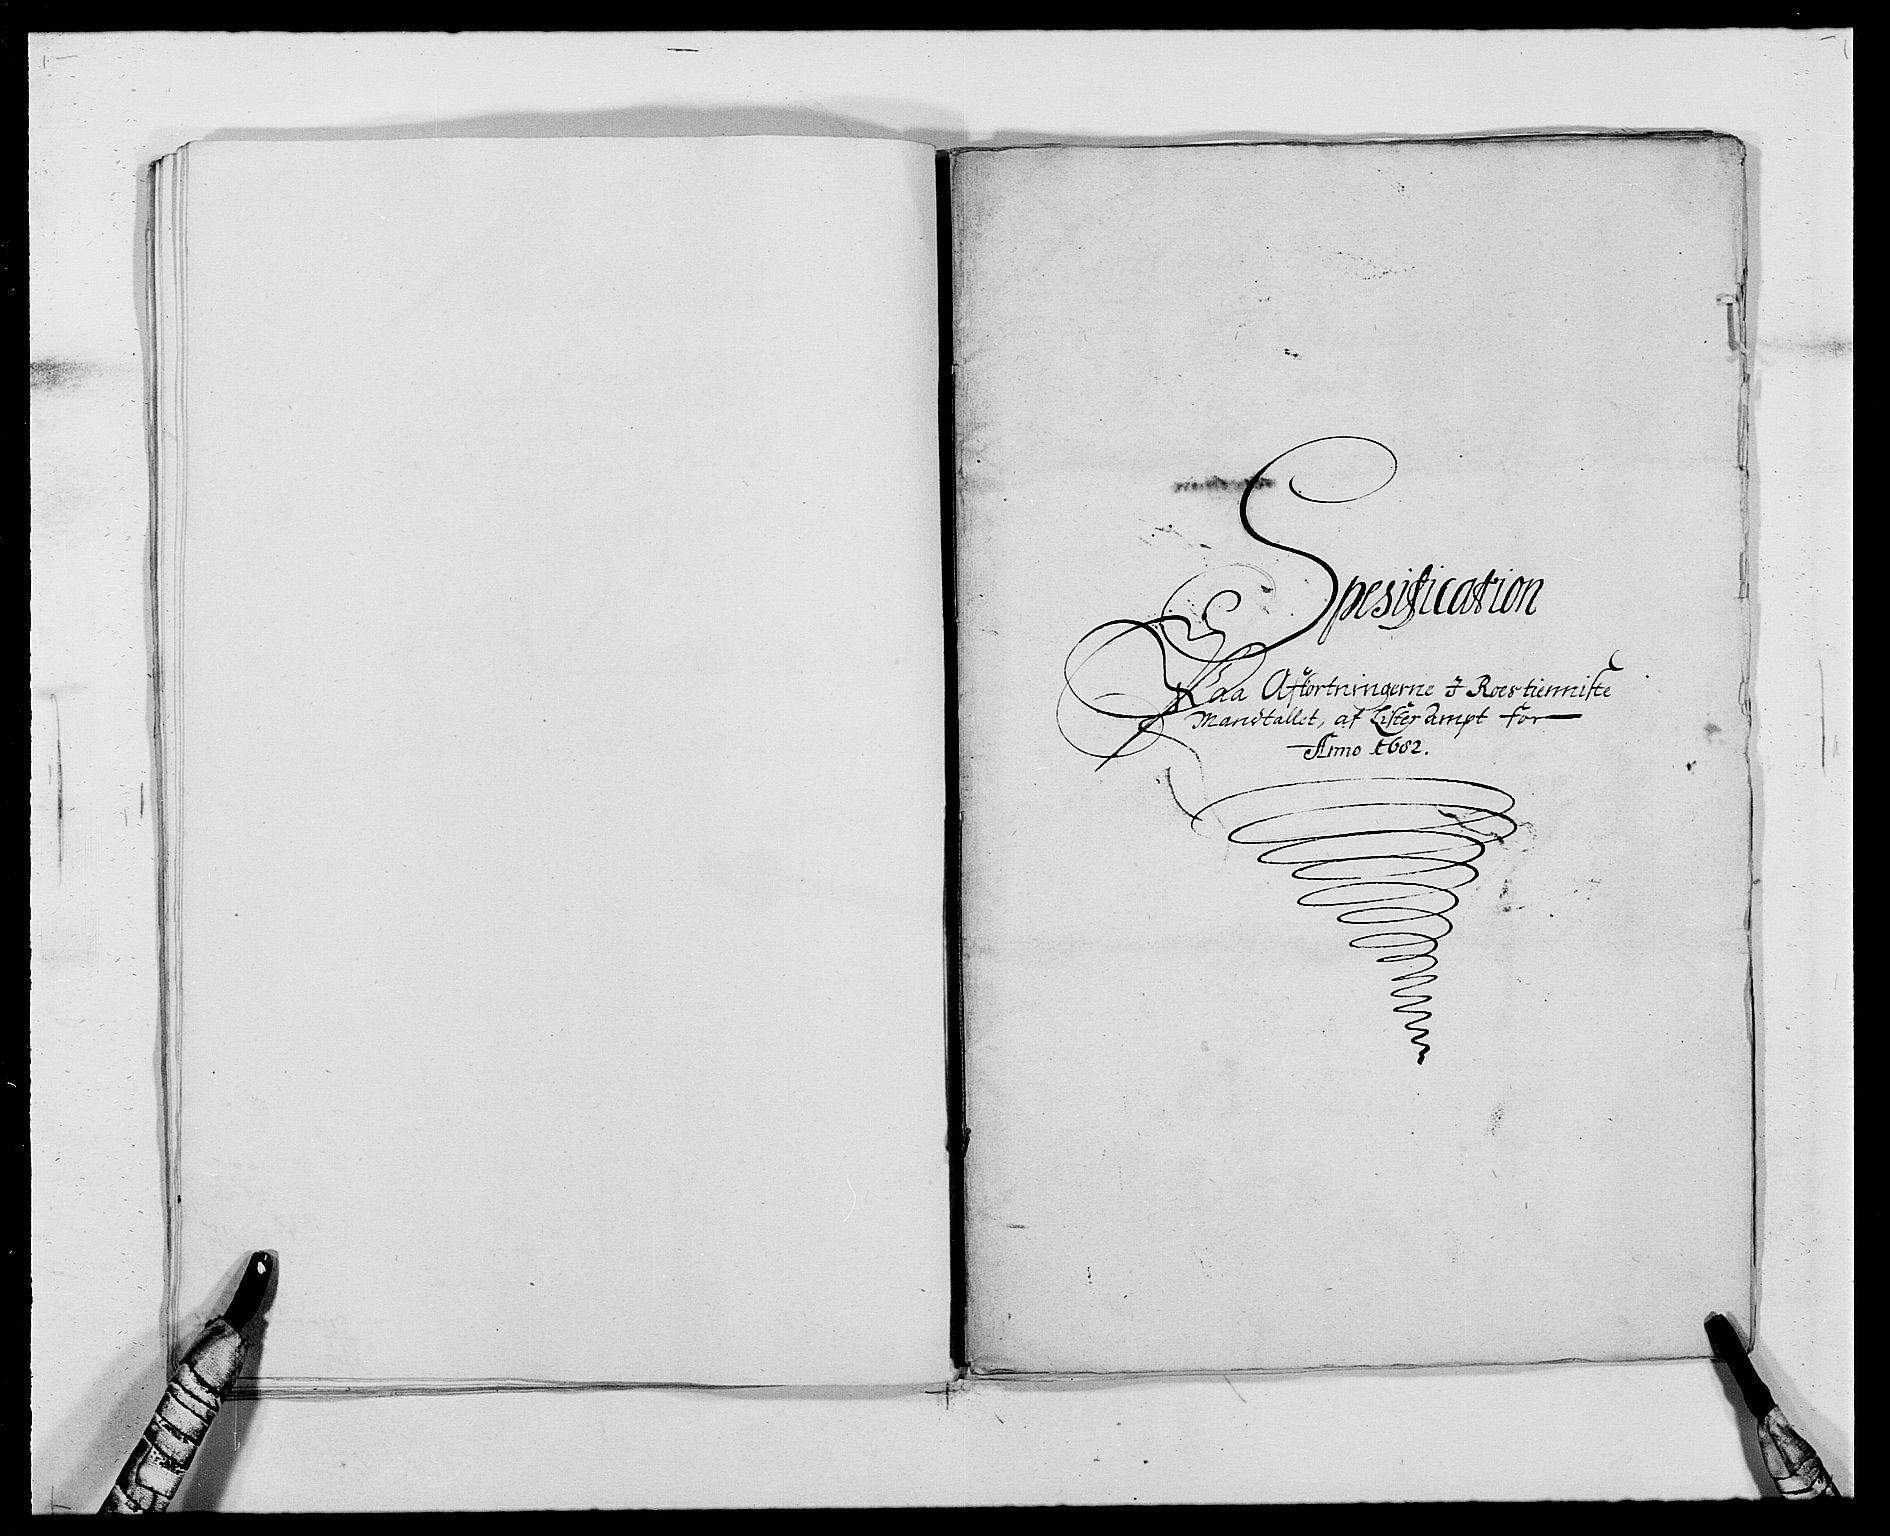 RA, Rentekammeret inntil 1814, Reviderte regnskaper, Fogderegnskap, R41/L2531: Fogderegnskap Lista, 1680-1682, s. 196